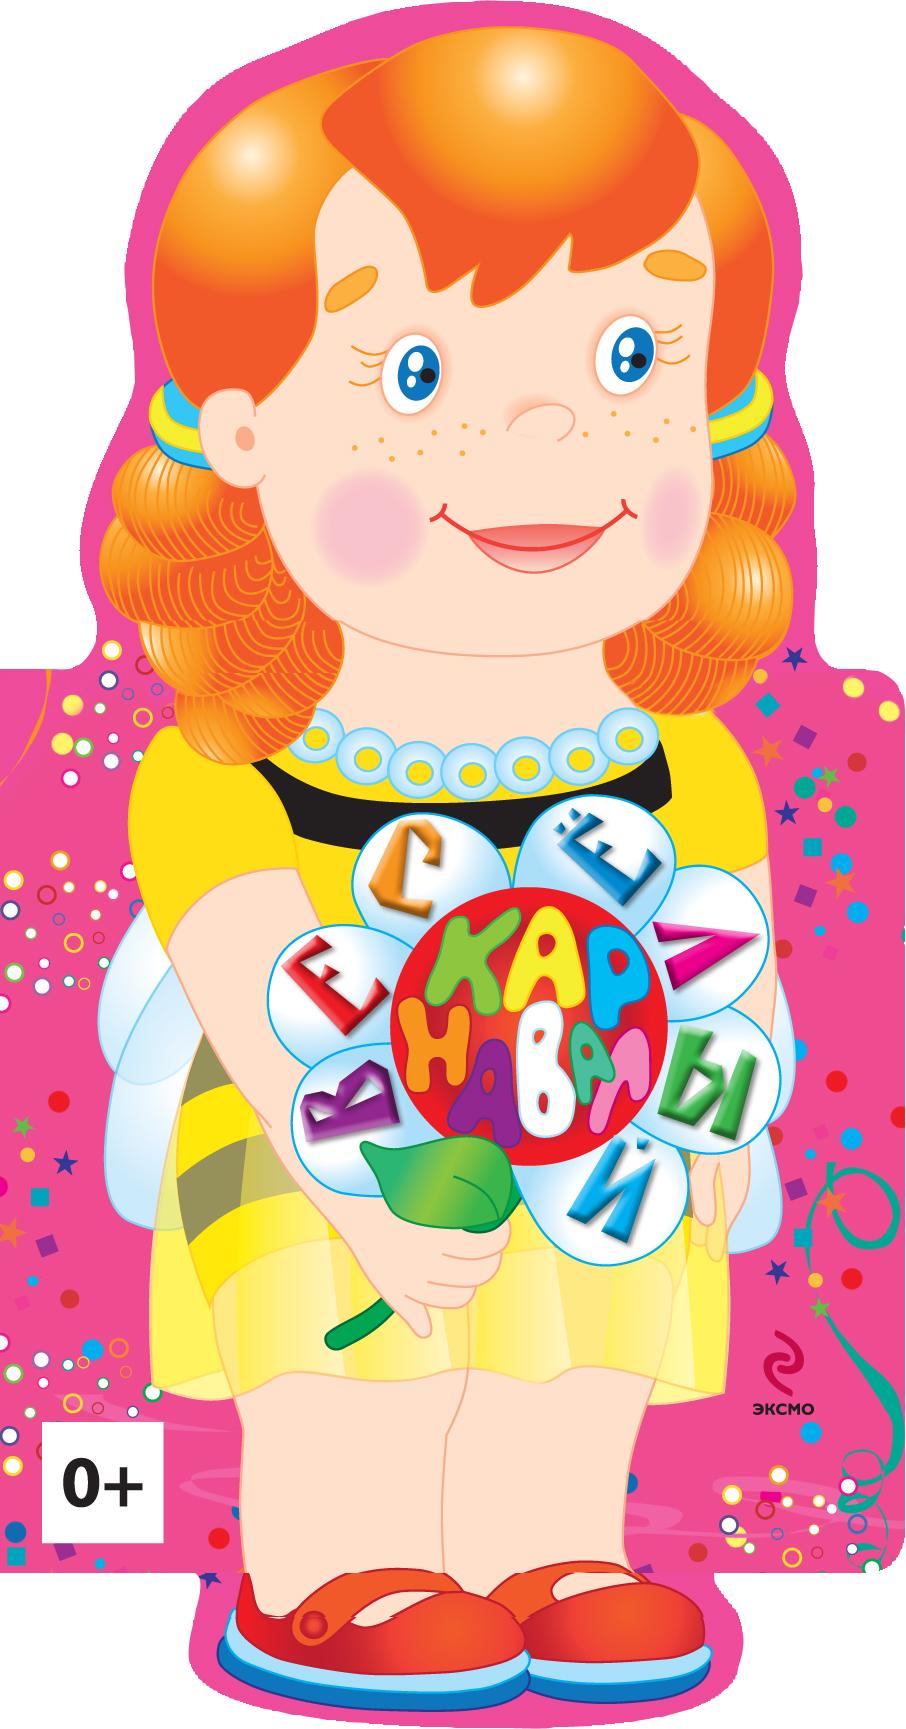 4+ Веселый карнавал (девочка) михайлов михаил илларионович два мороза книжка на картоне